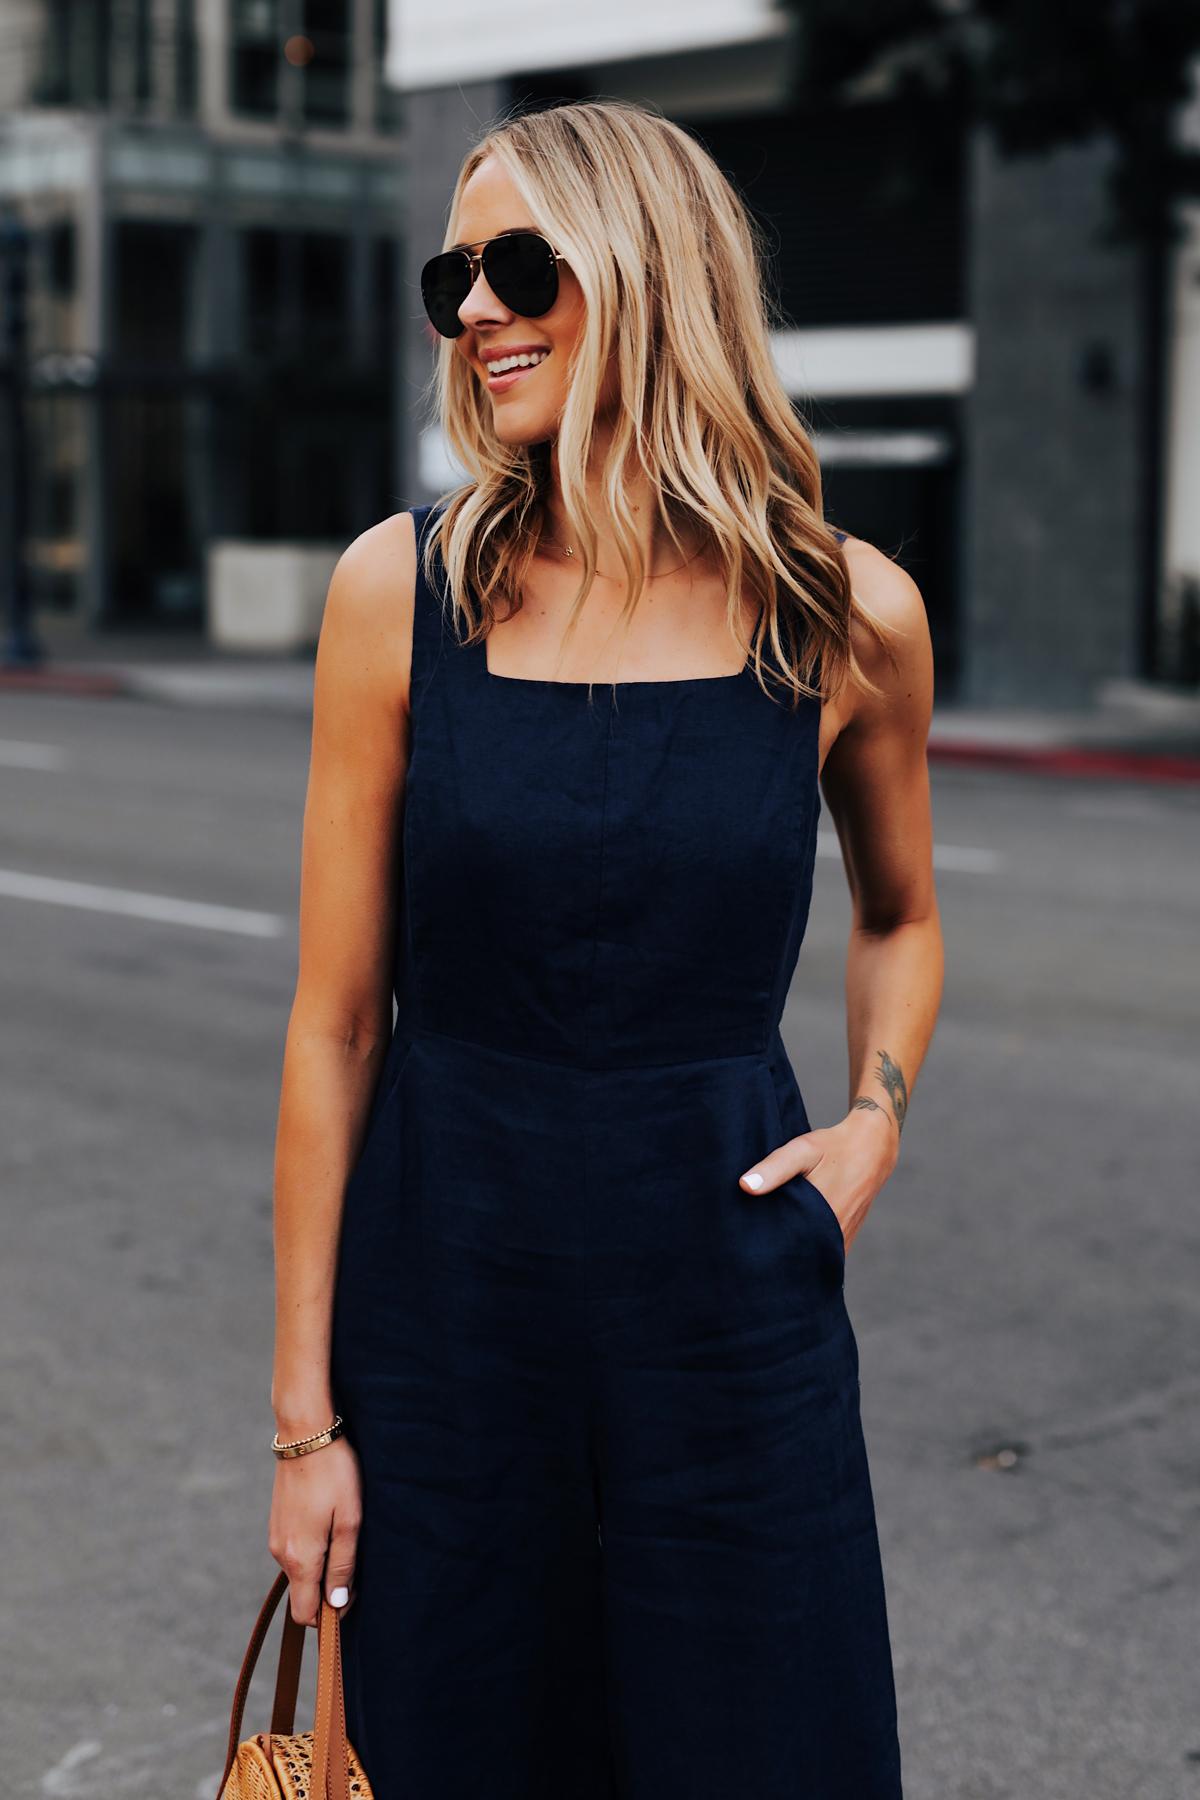 Blonde Woman Wearing Navy Jumpsuit Fashion Jackson San Diego Fashion Blogger Street Style